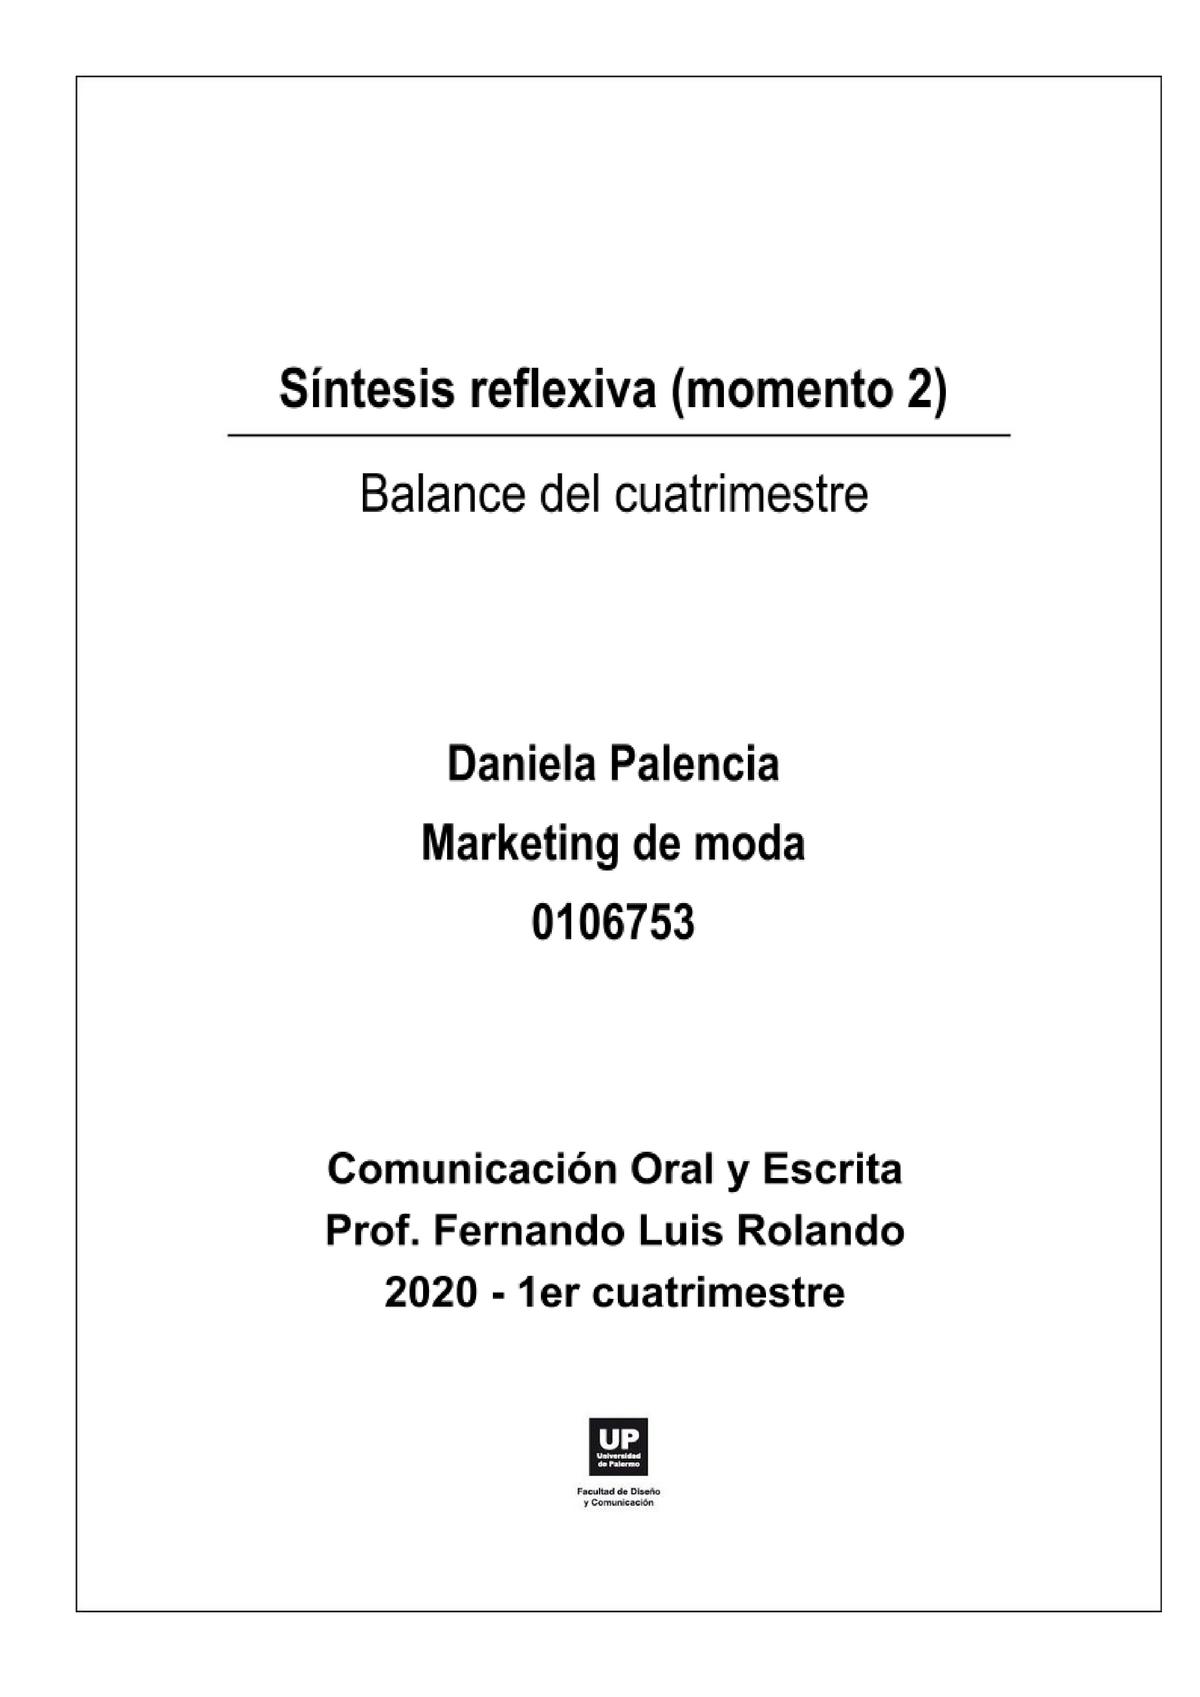 Síntesis Reflexiva Marketing Up Ntesis Reflexiva Momento Balance Del Studocu